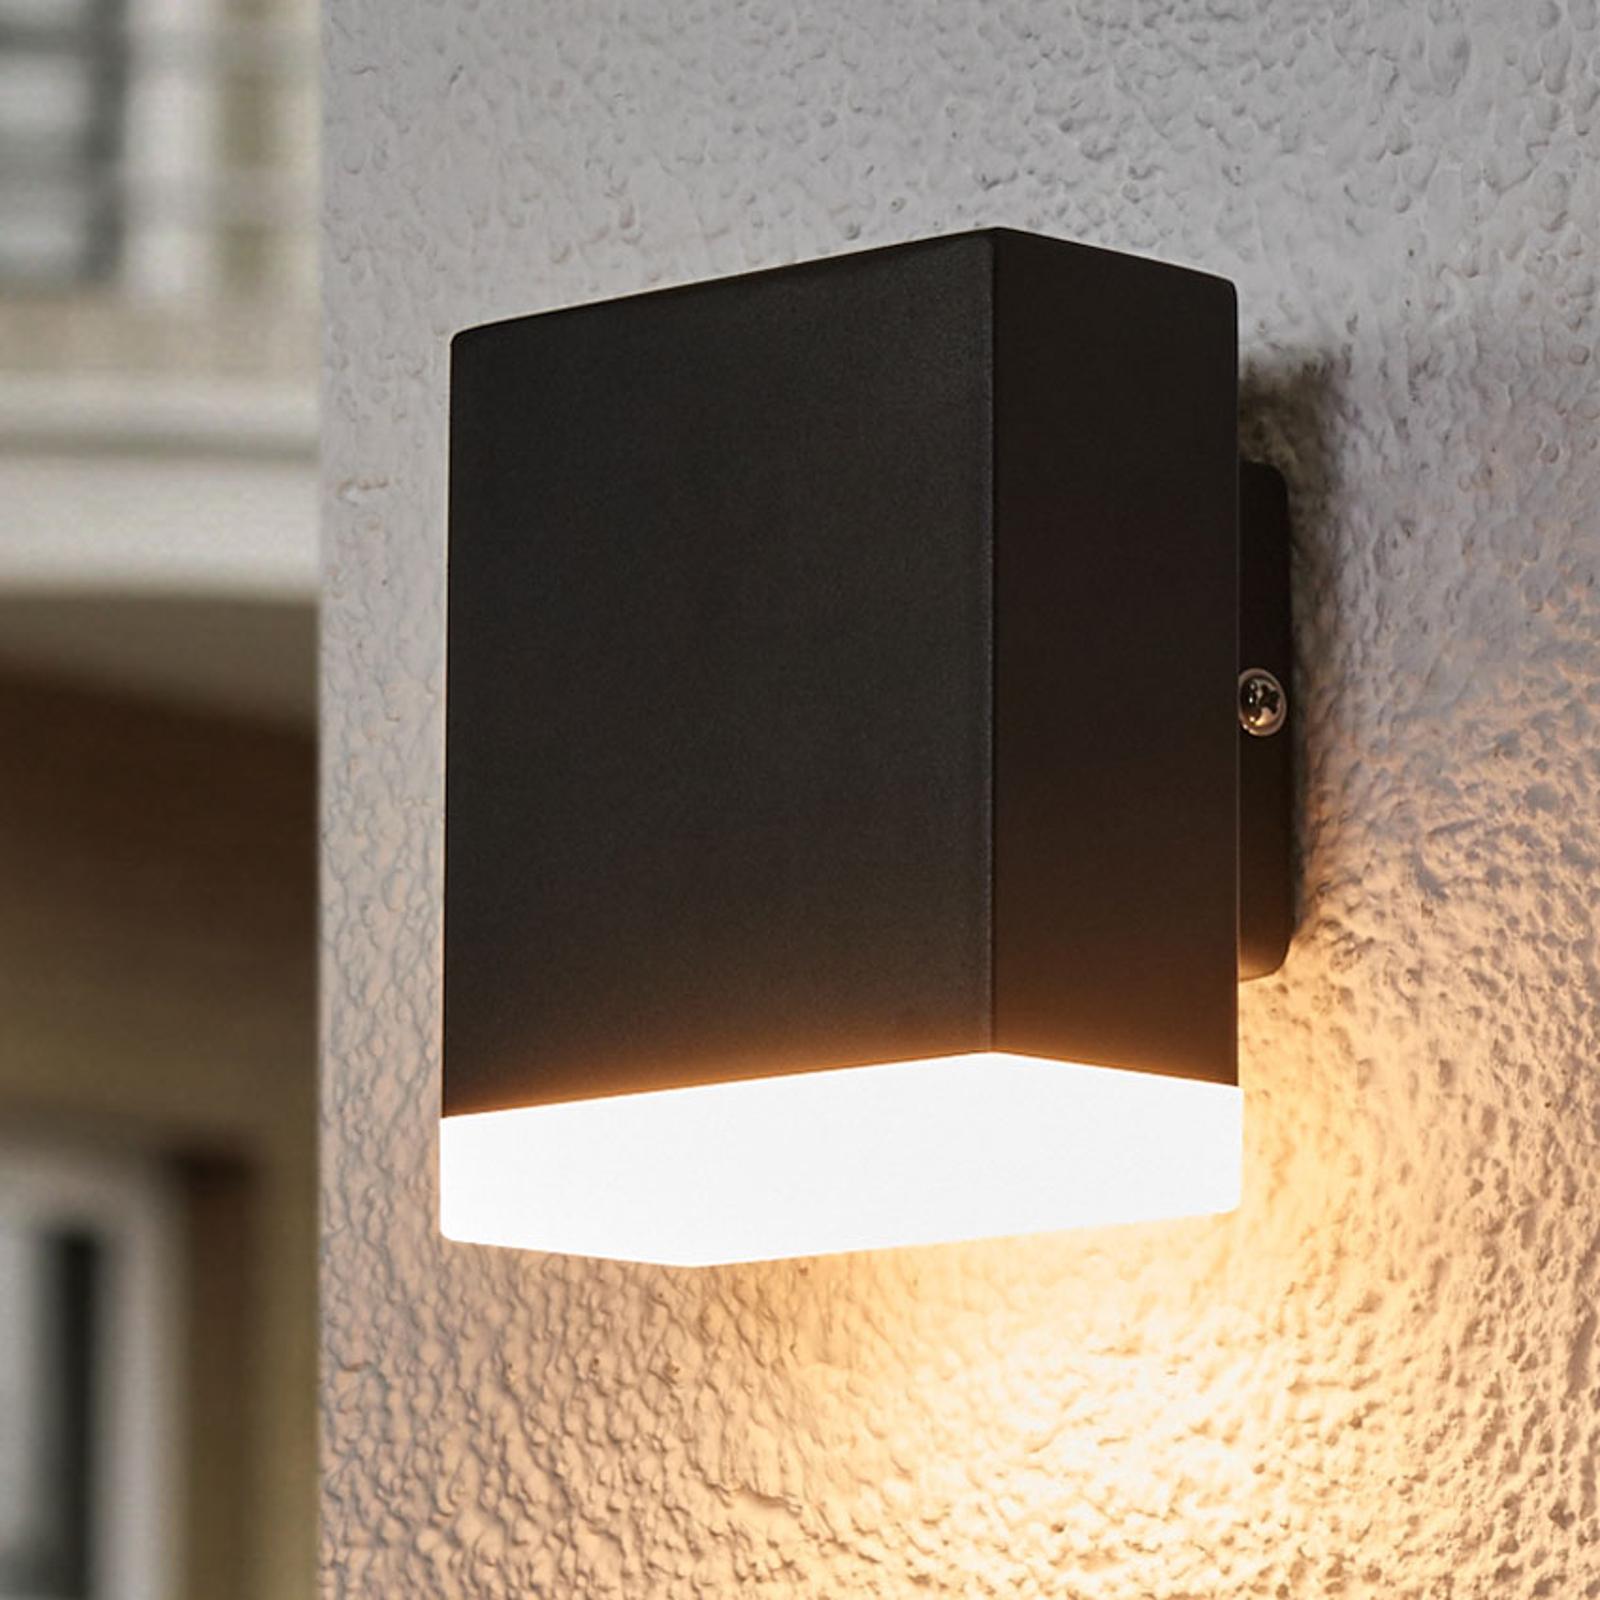 Nowoczesna lampa zewnętrzna LED Aya, czarna